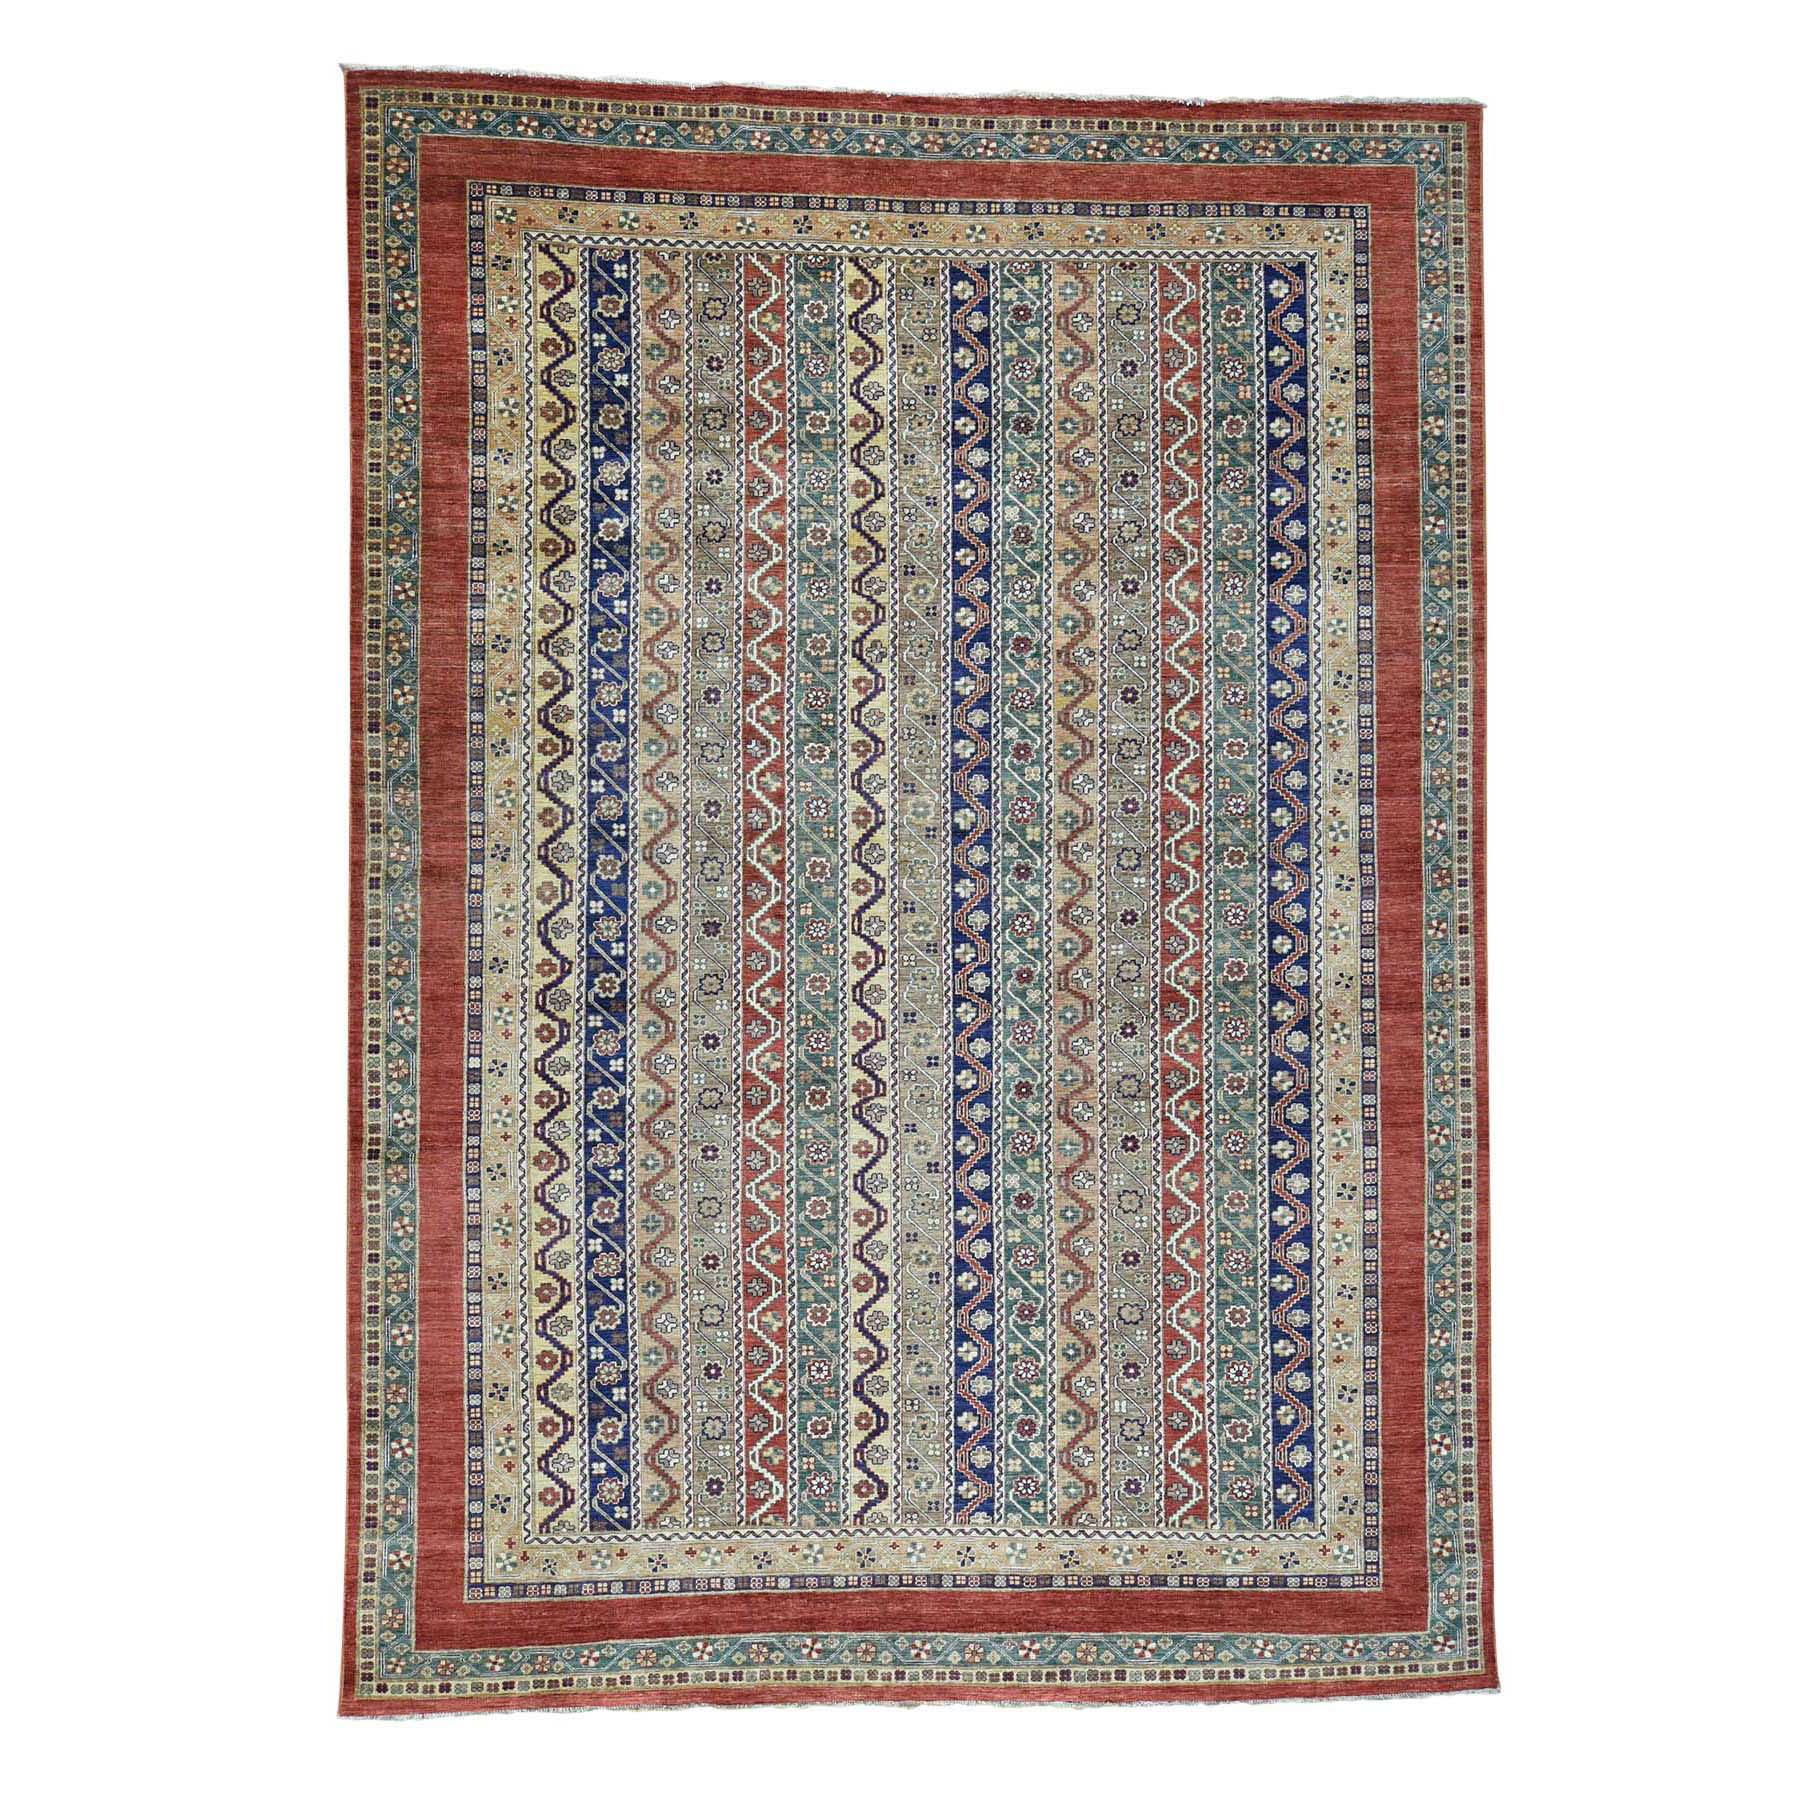 "10'X13'9"" Super Kazak Khorjin Shawl Design Hand-Knotted Pure Wool Rug moac686b"